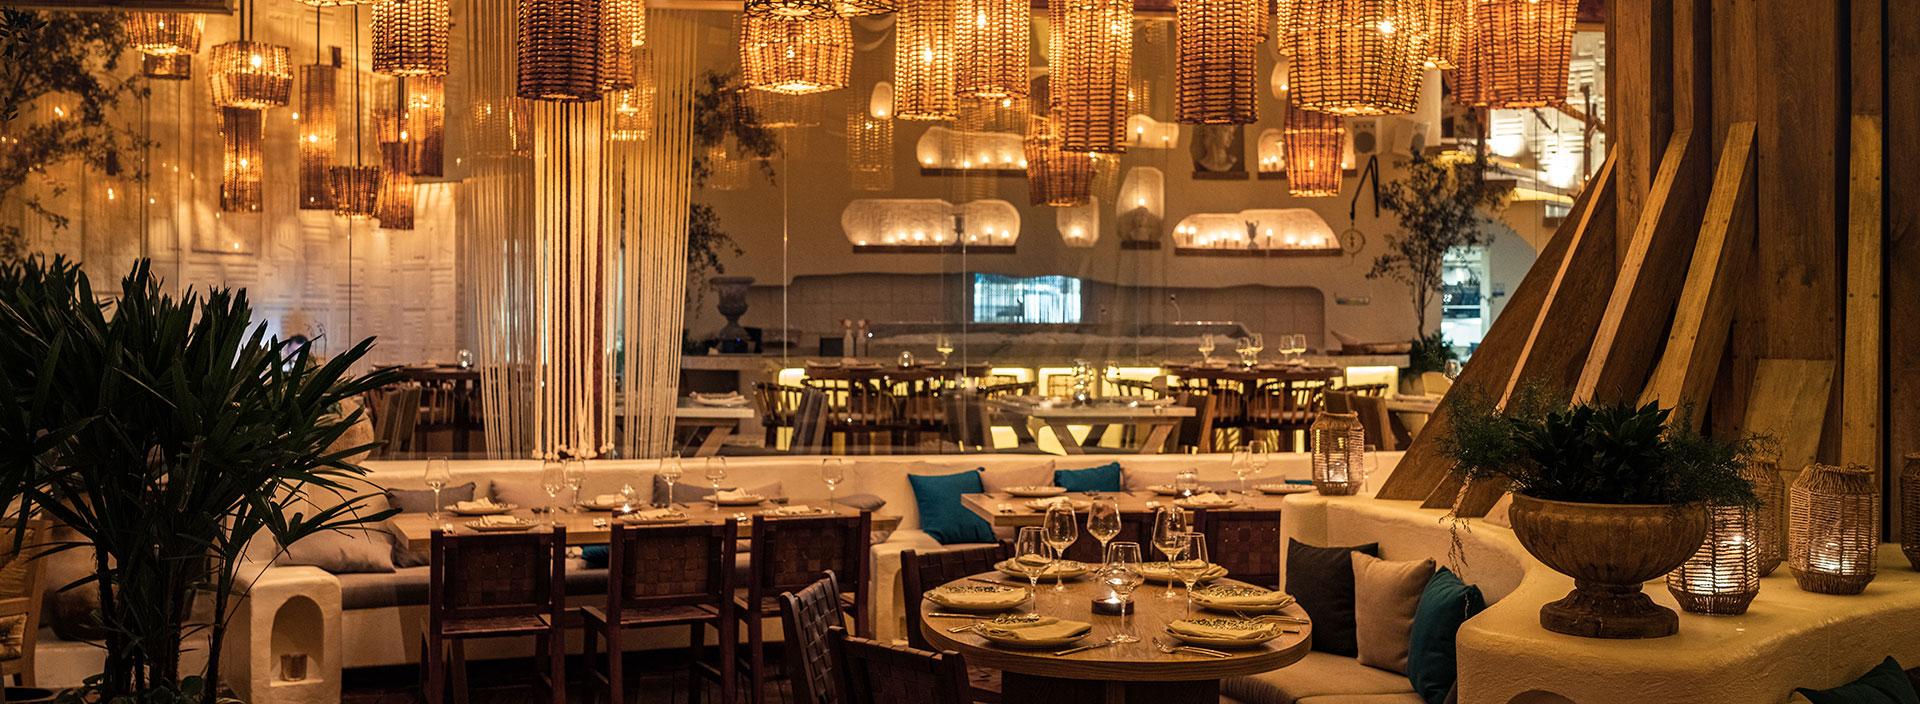 Ilios Greek Restaurant In Cancun